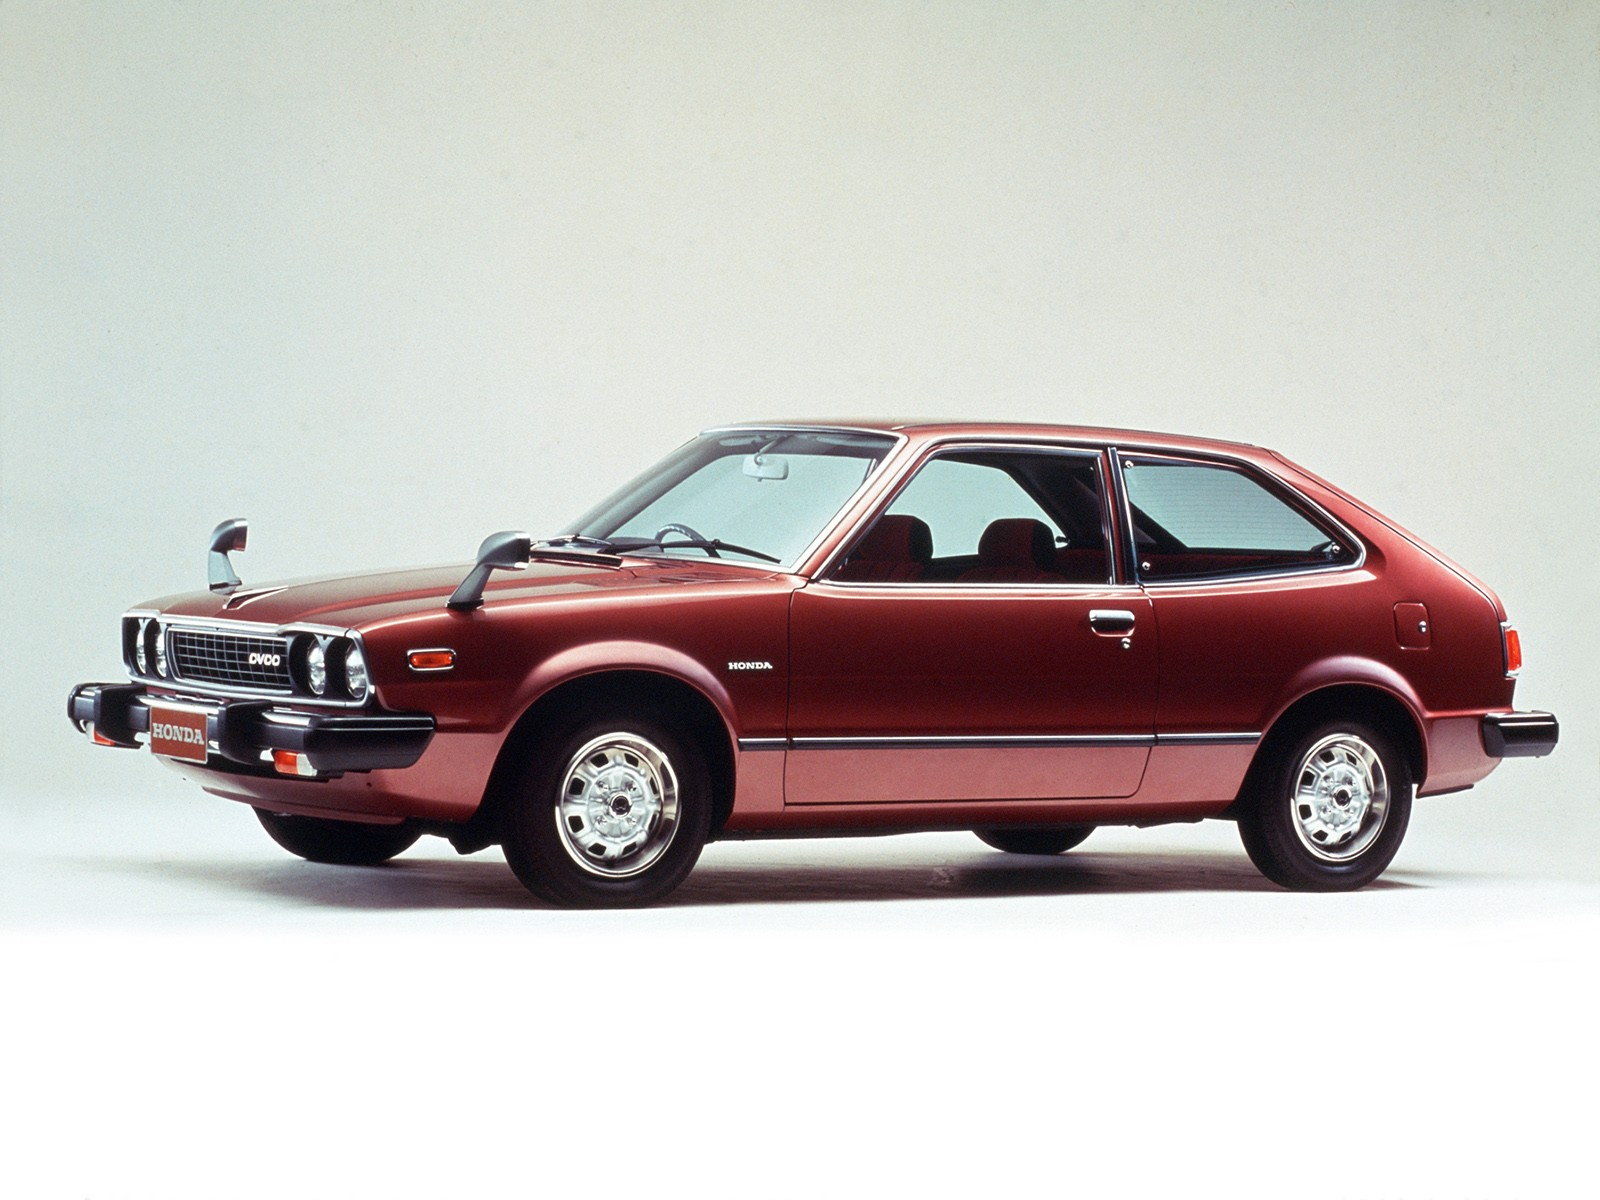 Honda Accord Evolution >> HONDA Accord 3 Doors specs & photos - 1976, 1977, 1978, 1979, 1980, 1981 - autoevolution